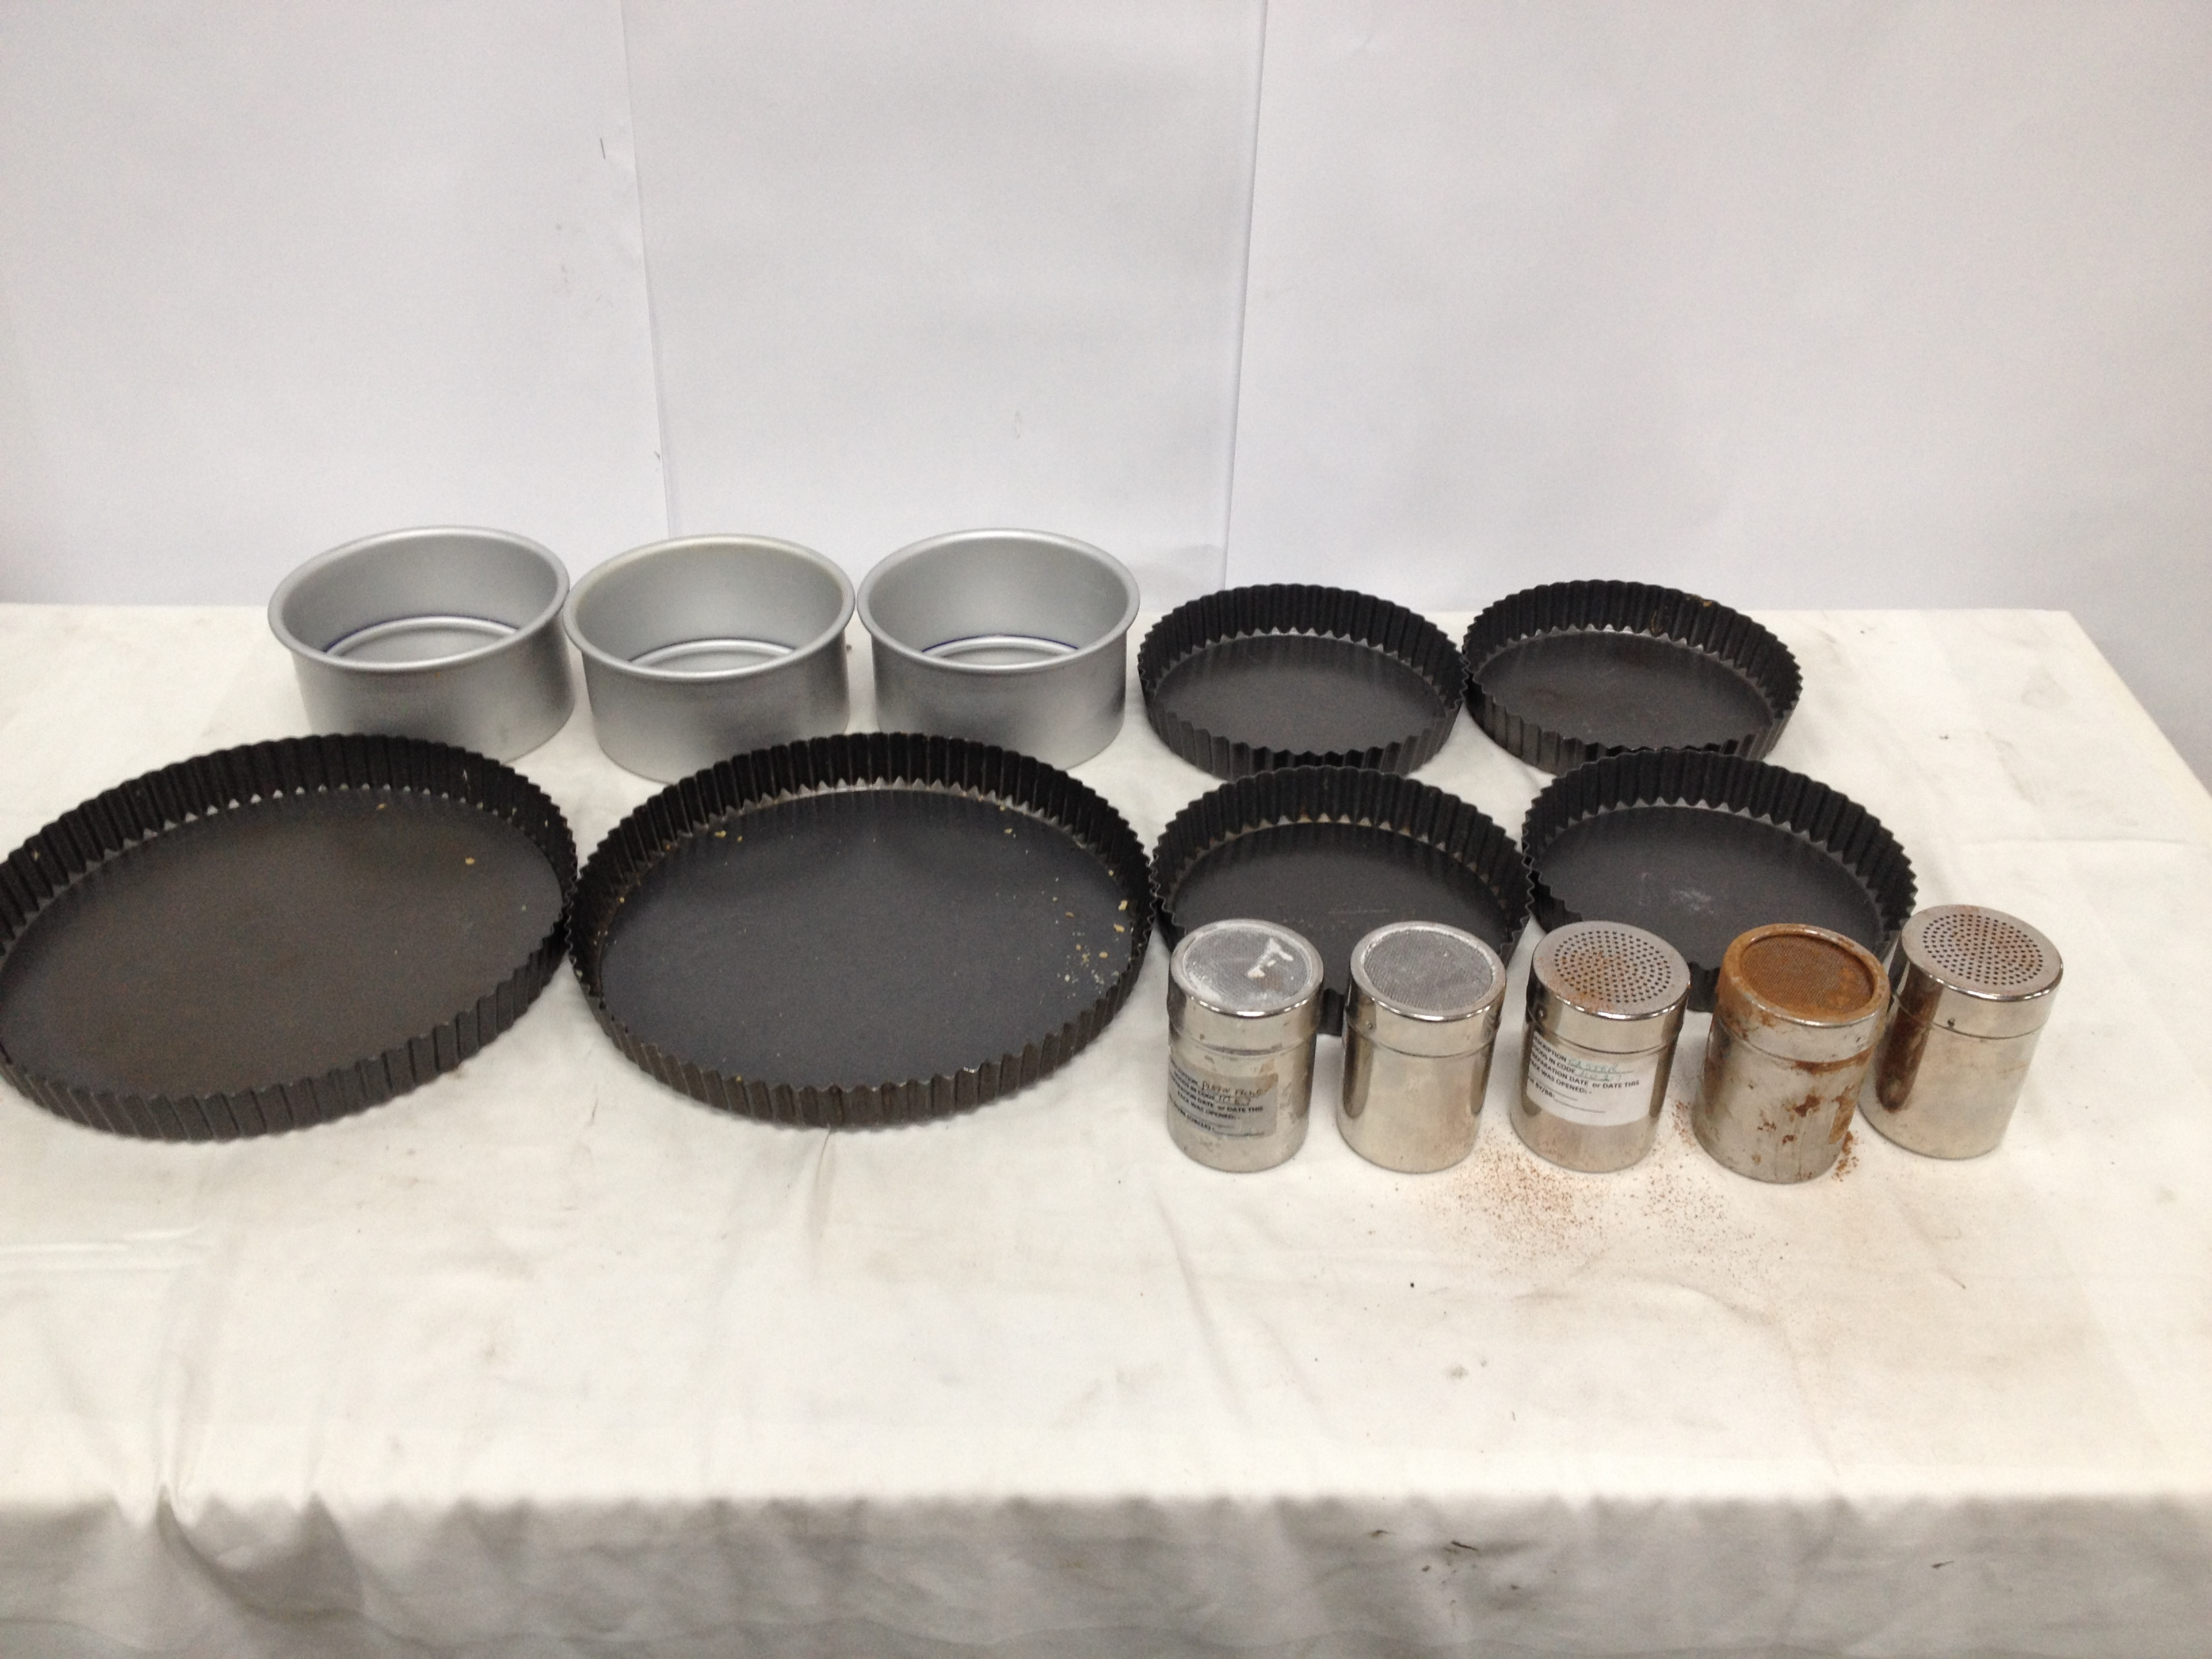 lakeland my kitchen cake tins 24 x 7 5 1 x 4 23 x 11. Black Bedroom Furniture Sets. Home Design Ideas